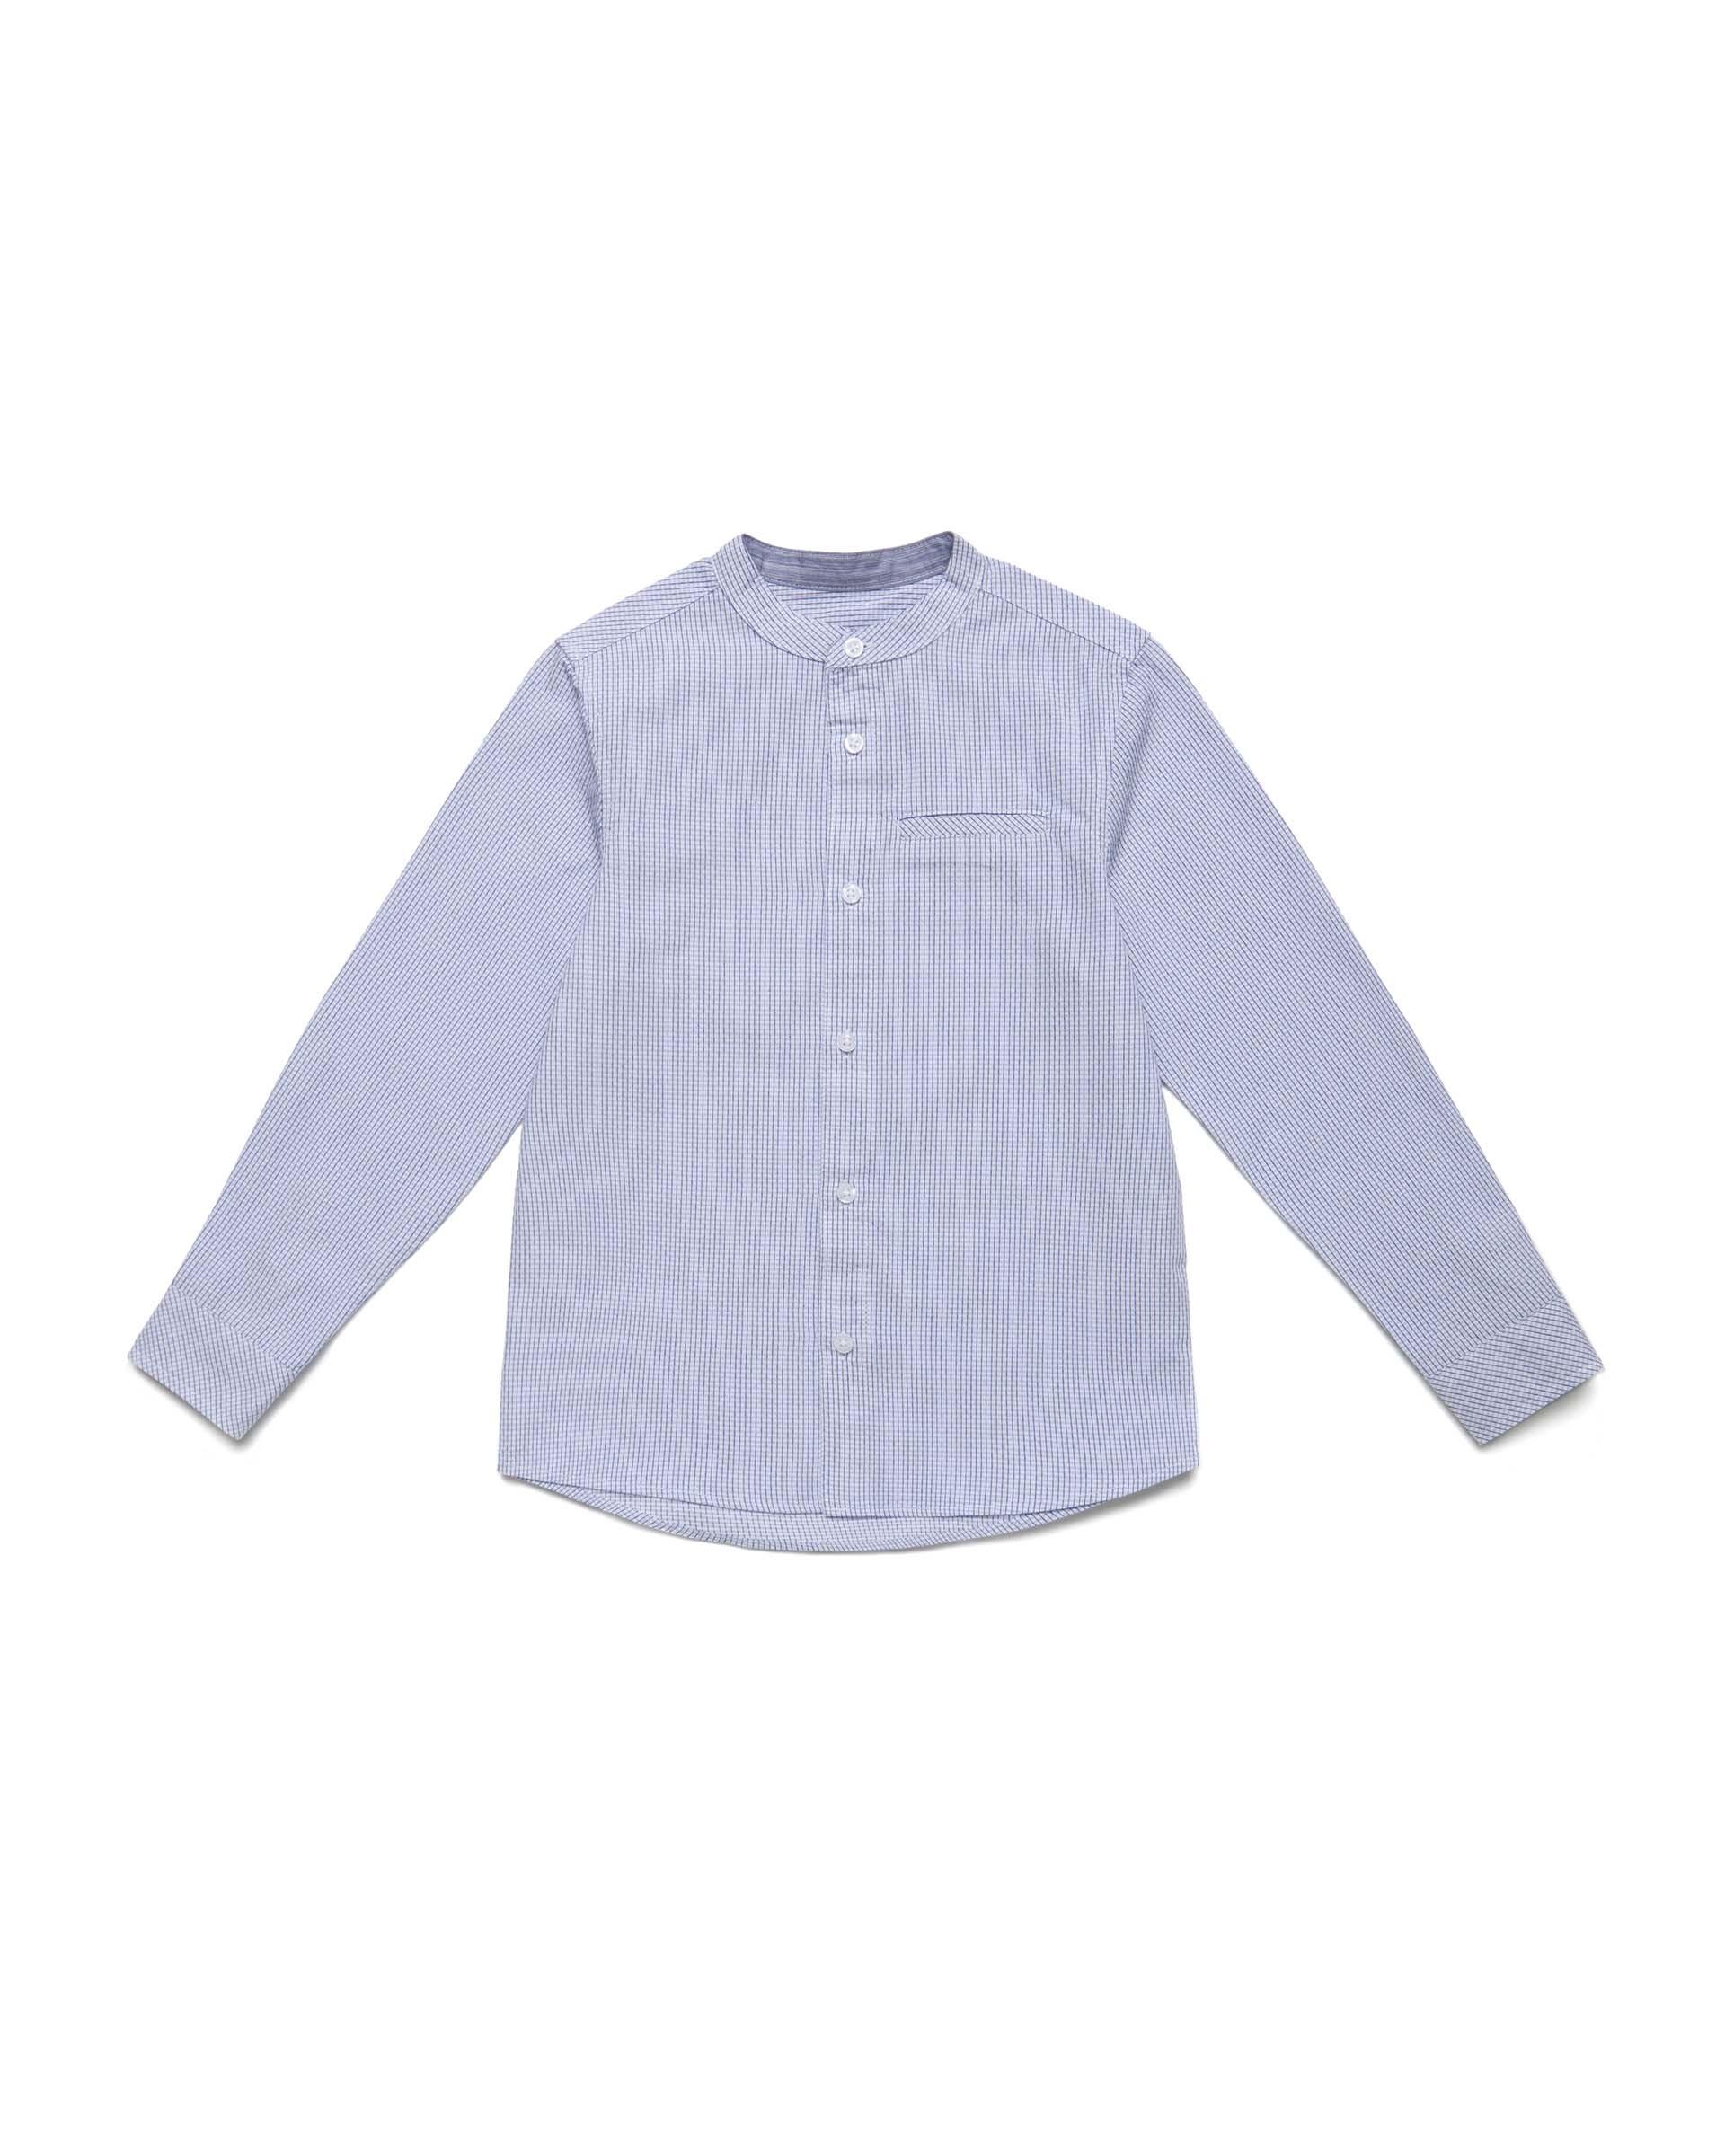 Купить 20P_5PC45QHA0_902, Рубашка для мальчиков Benetton 5PC45QHA0_902 р-р 158, United Colors of Benetton, Рубашки для мальчиков